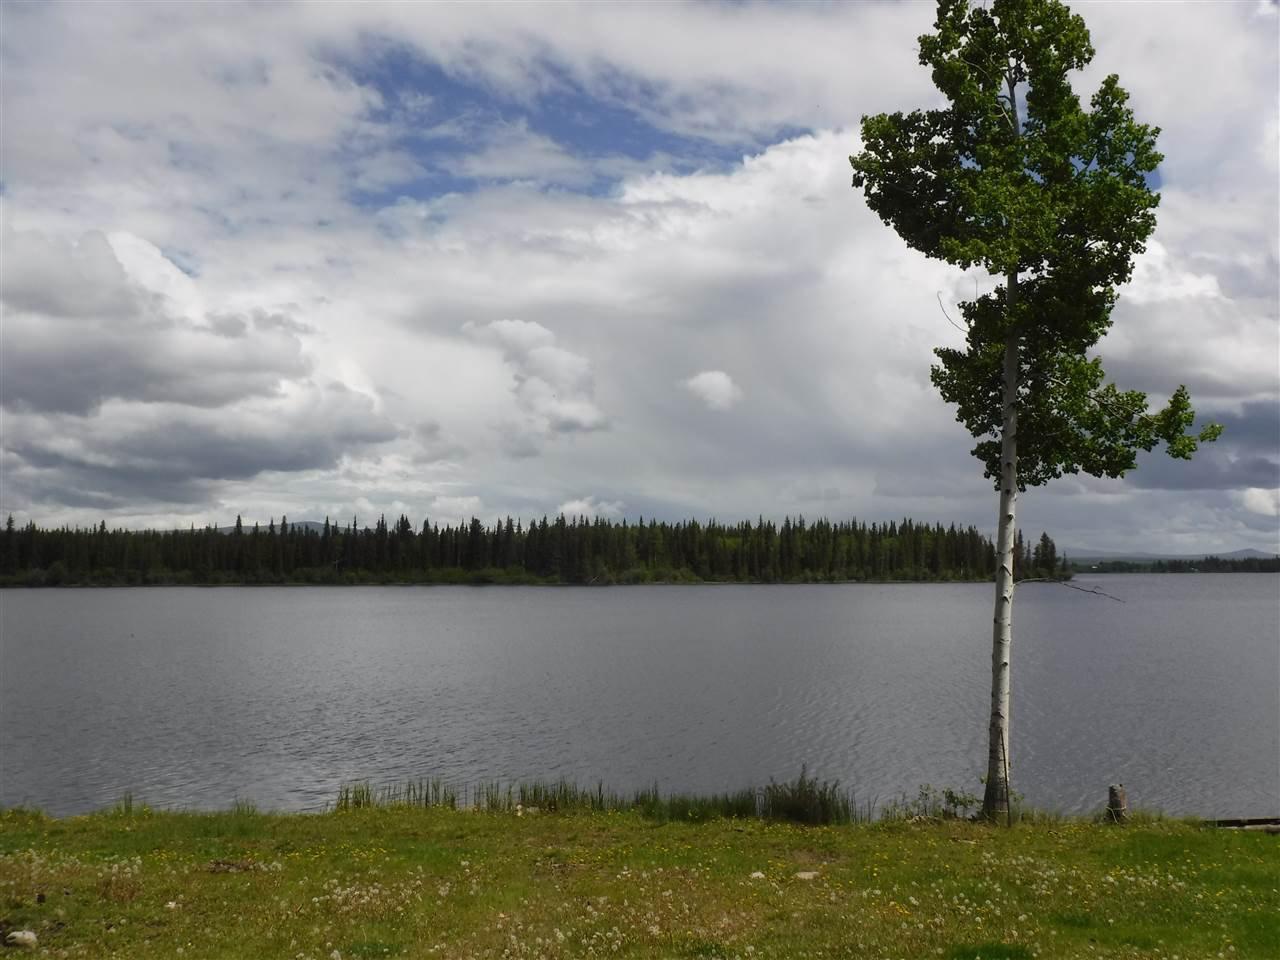 Photo 7: Photos: 3126 ELSEY Road in Williams Lake: Williams Lake - Rural West House for sale (Williams Lake (Zone 27))  : MLS®# R2467730